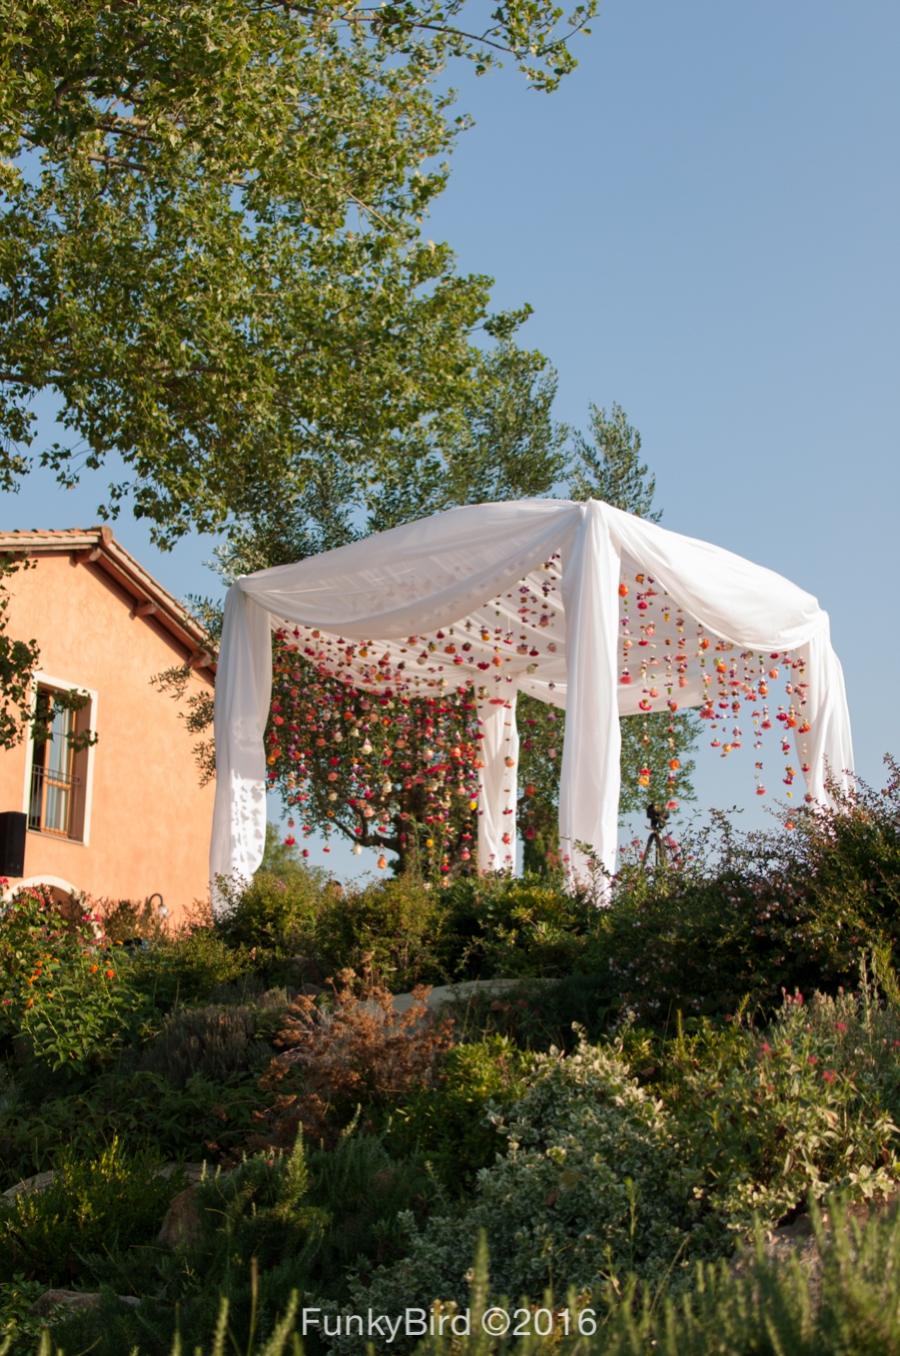 tuscany wedding photography trouwen in toscane wedding flowers italy destination wedding_0629.jpg